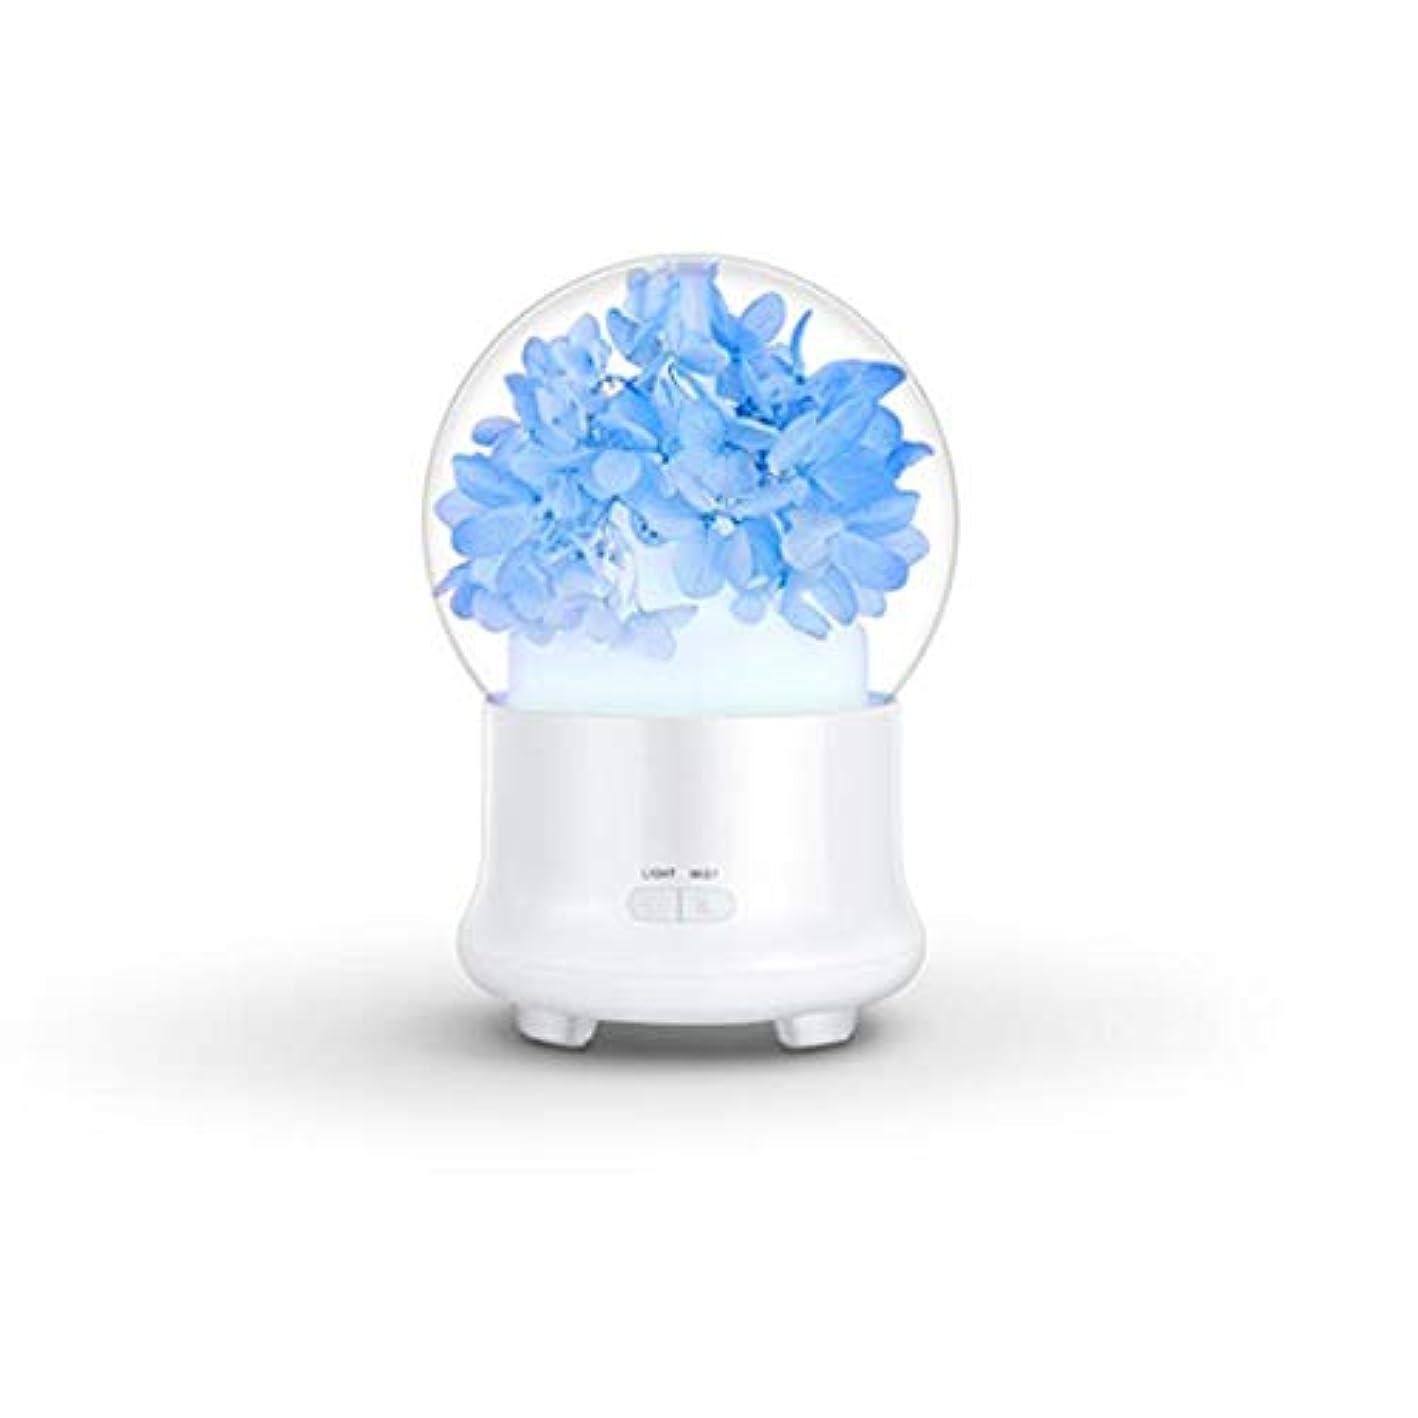 ACHICOO アロマディフューザー 加湿器 花 電気 カラフル LED ミストフォッガー かわいい 安全 24V 12 x 12 x 16.8cm ブルー